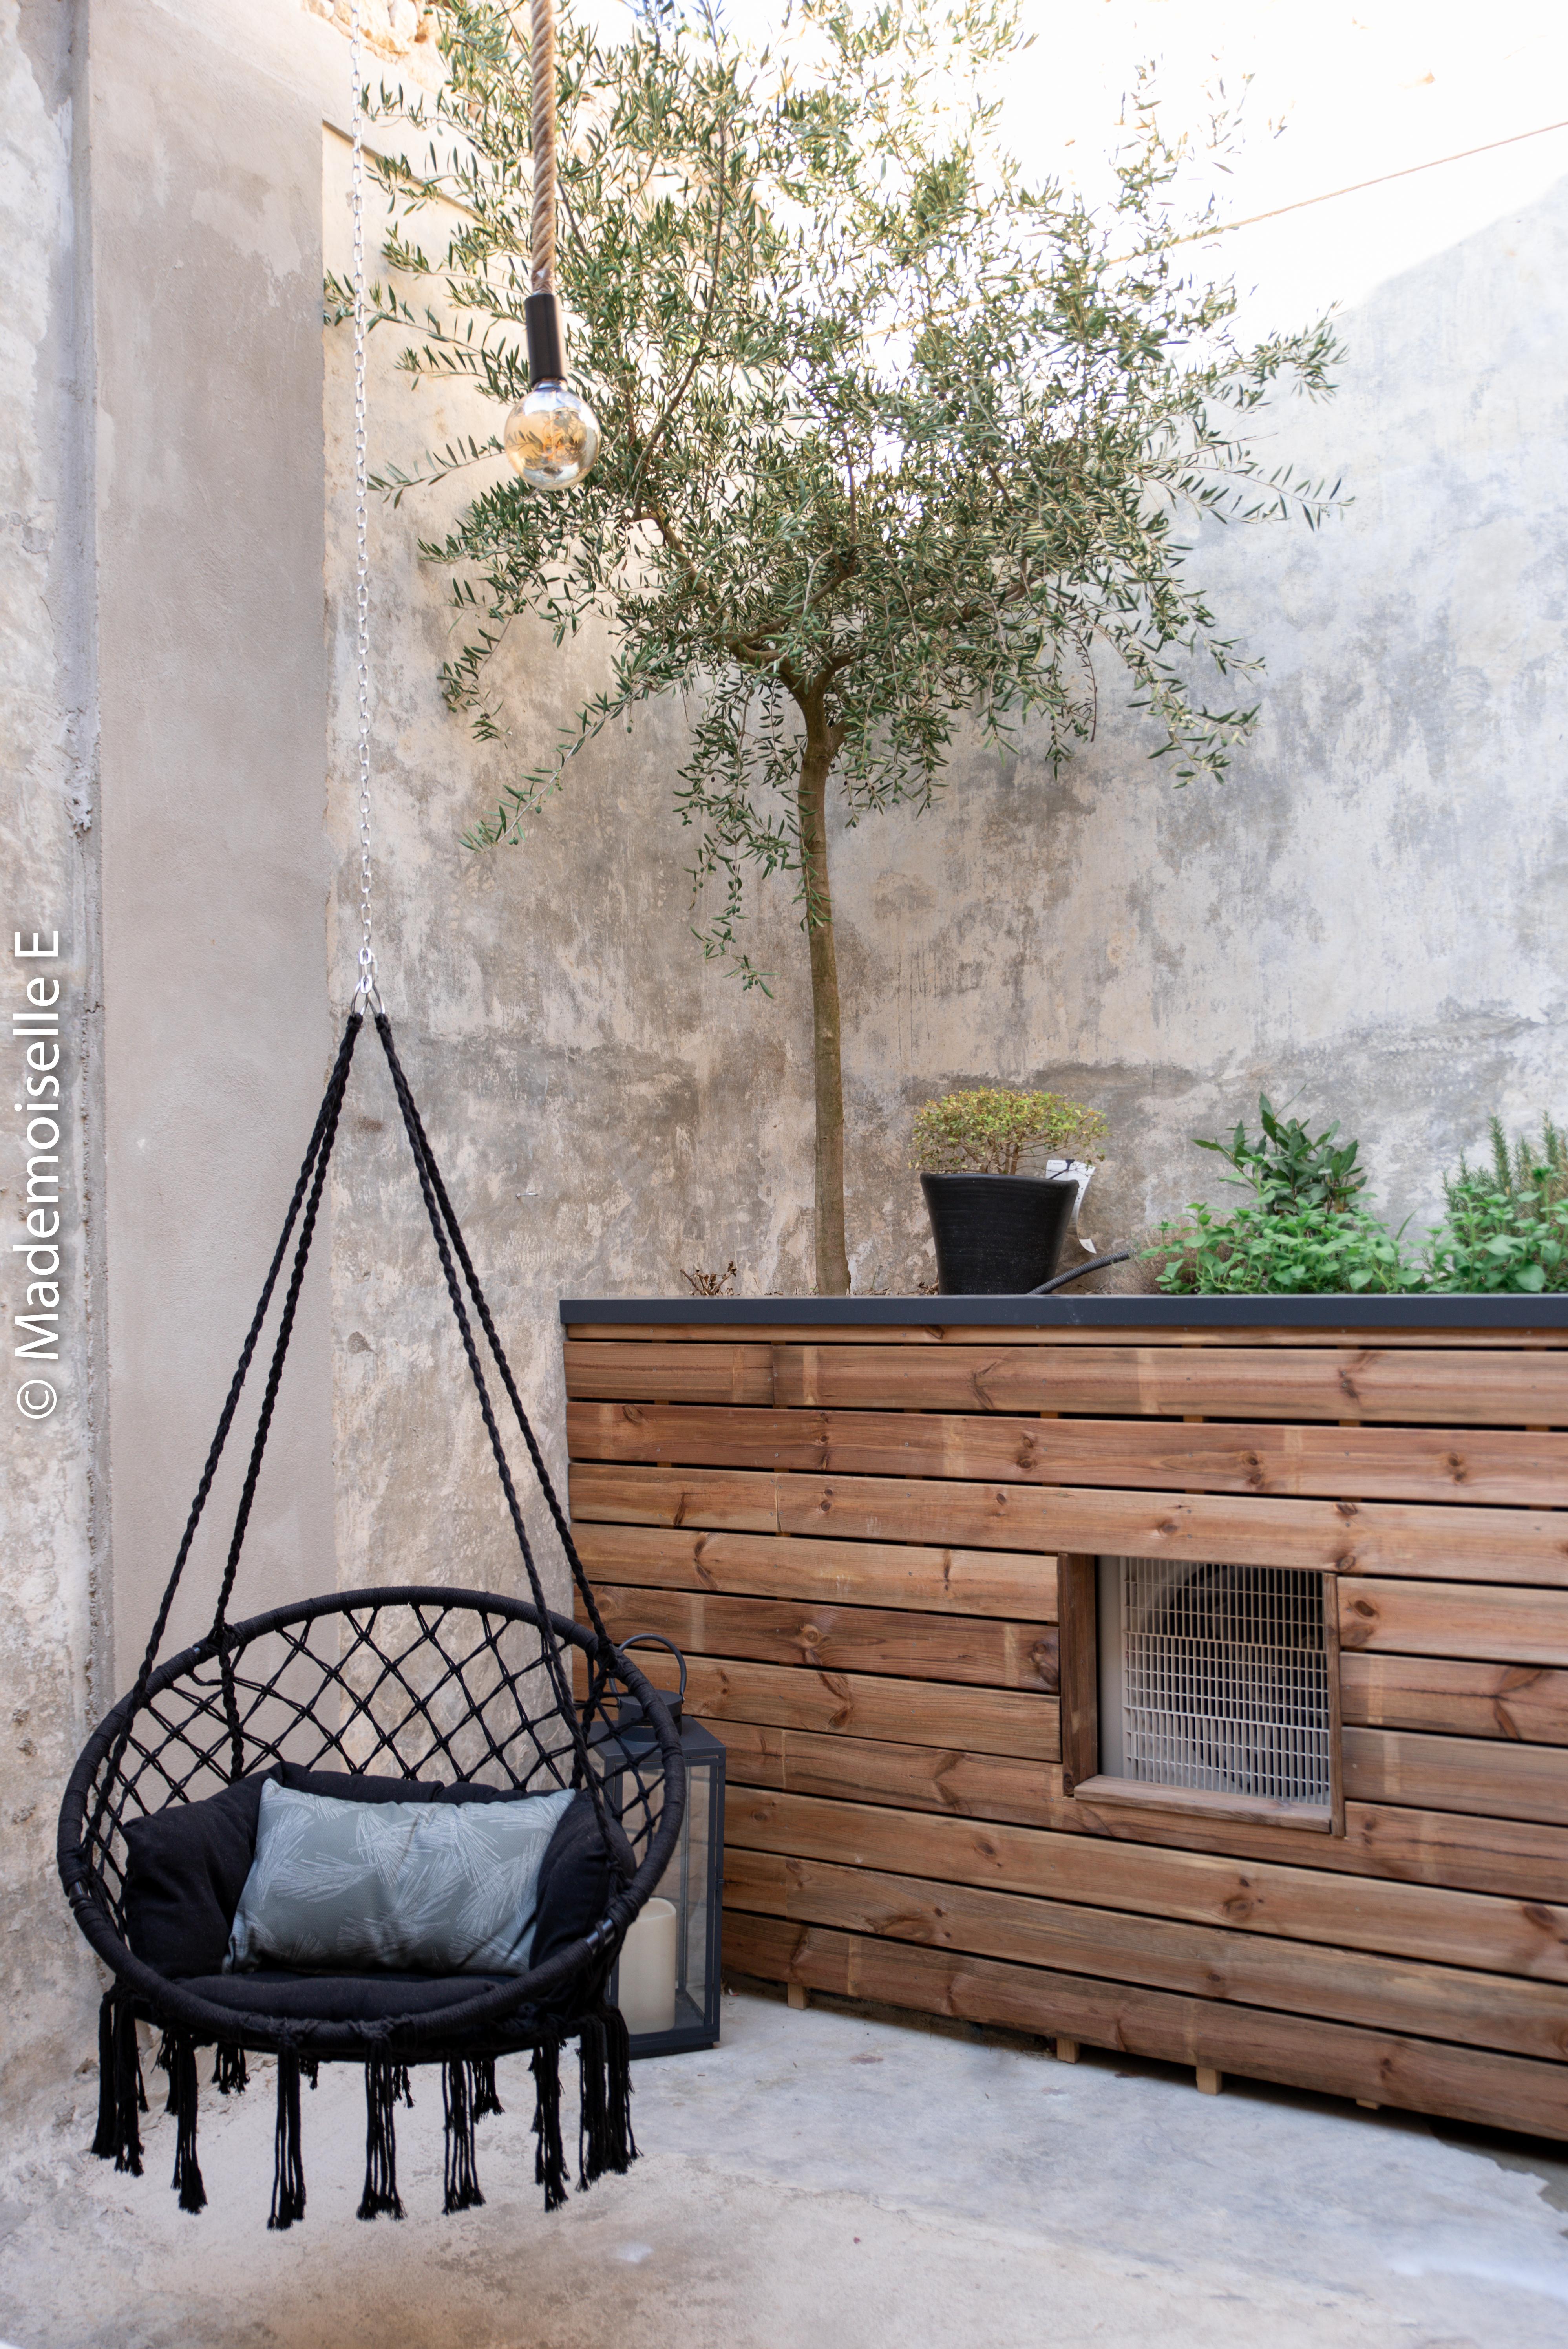 5-conseils-pour-amenager-sa-terrasse-4-mademoiselle-e